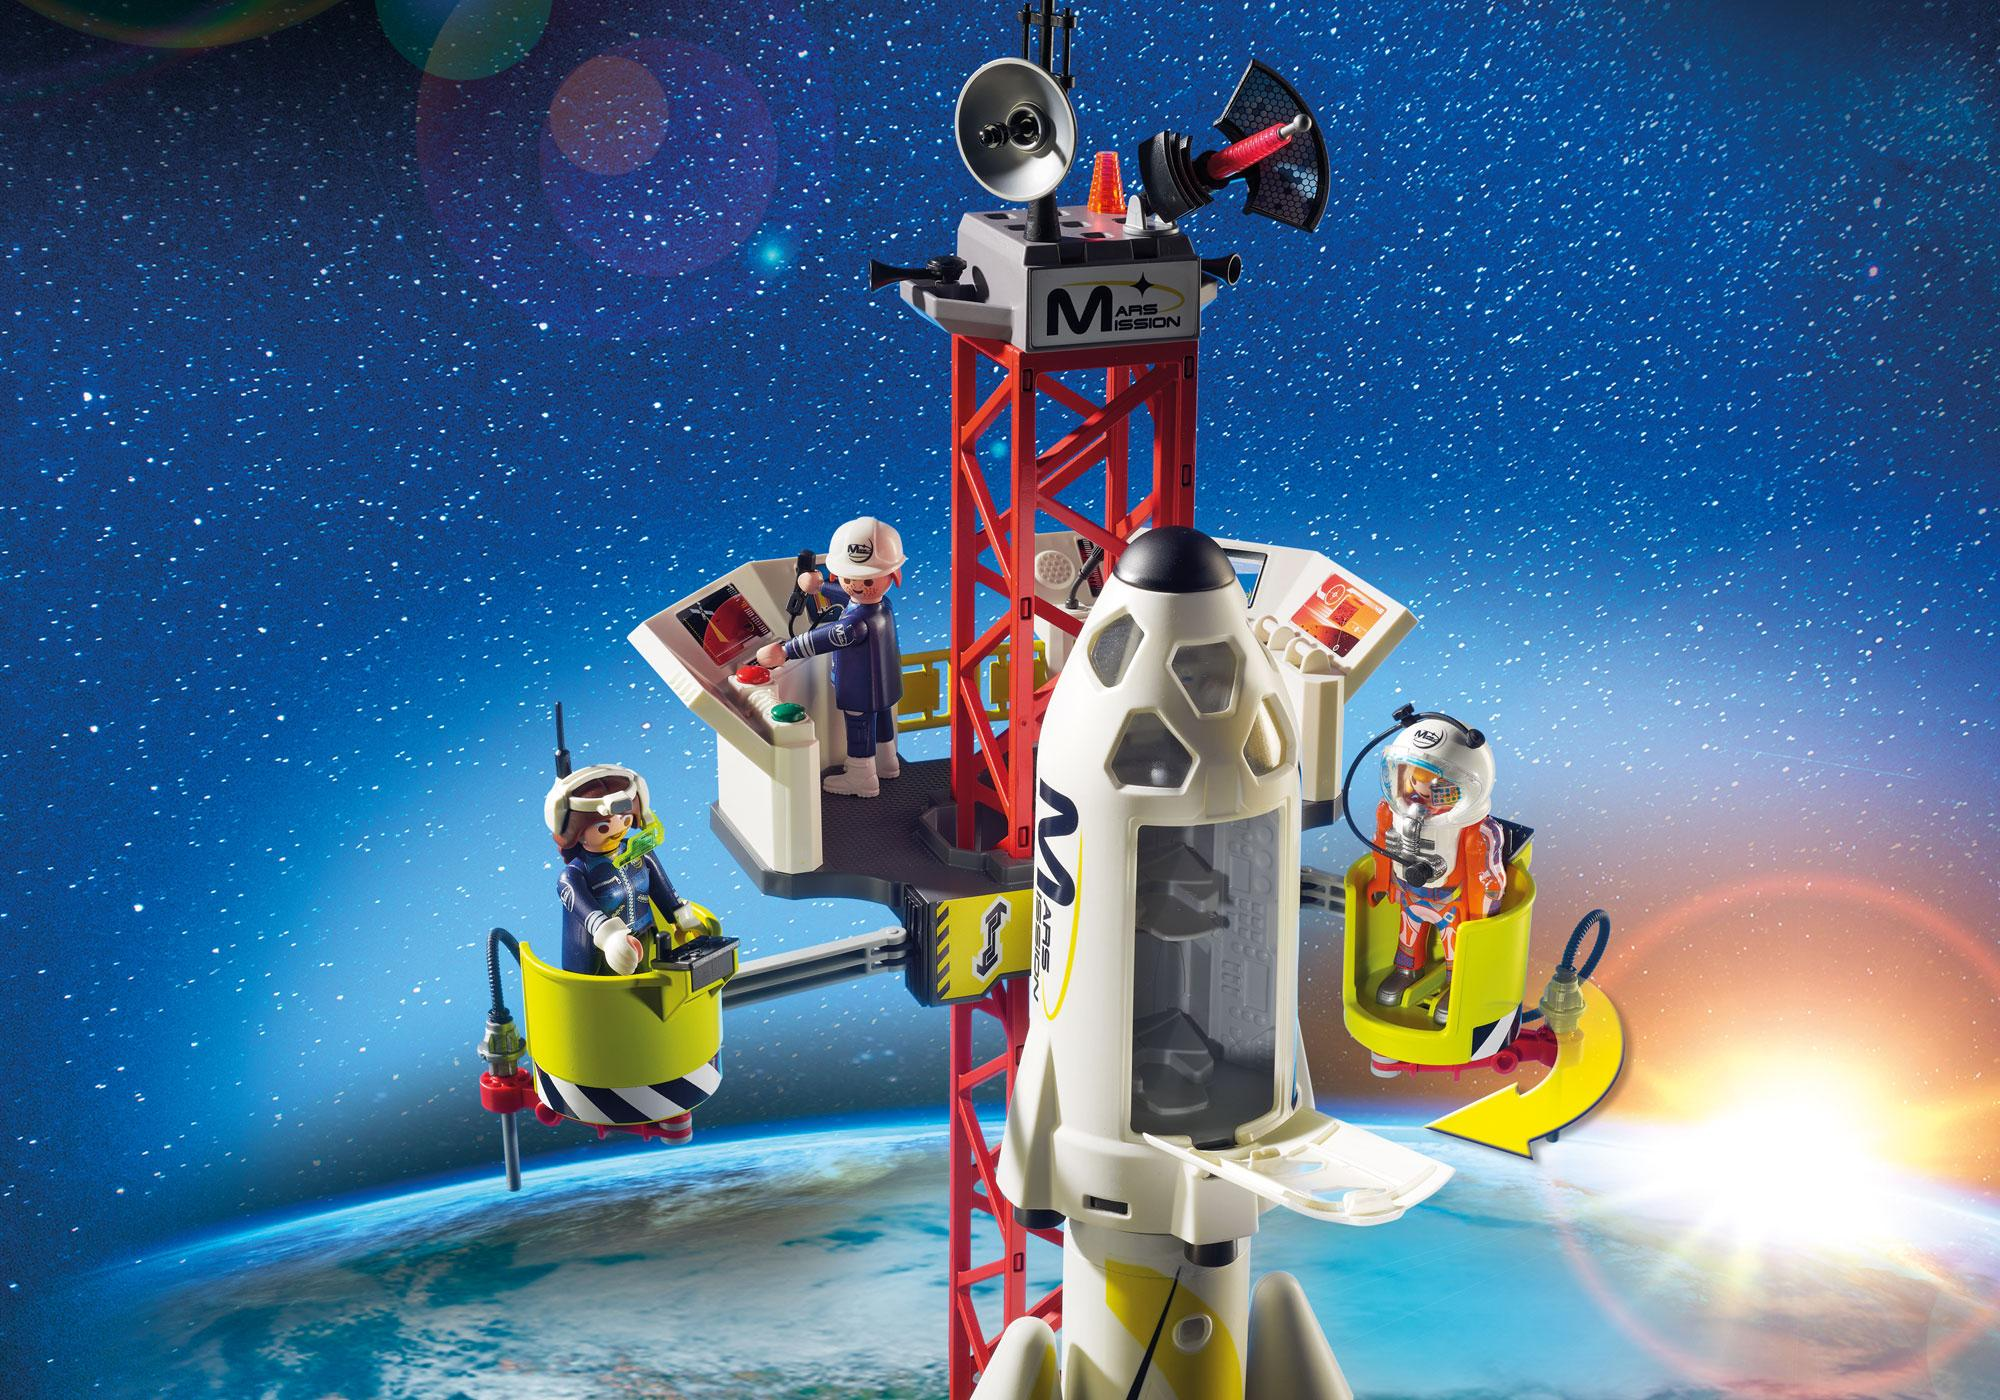 http://media.playmobil.com/i/playmobil/9488_product_extra1/Rakieta kosmiczna z rampą startową